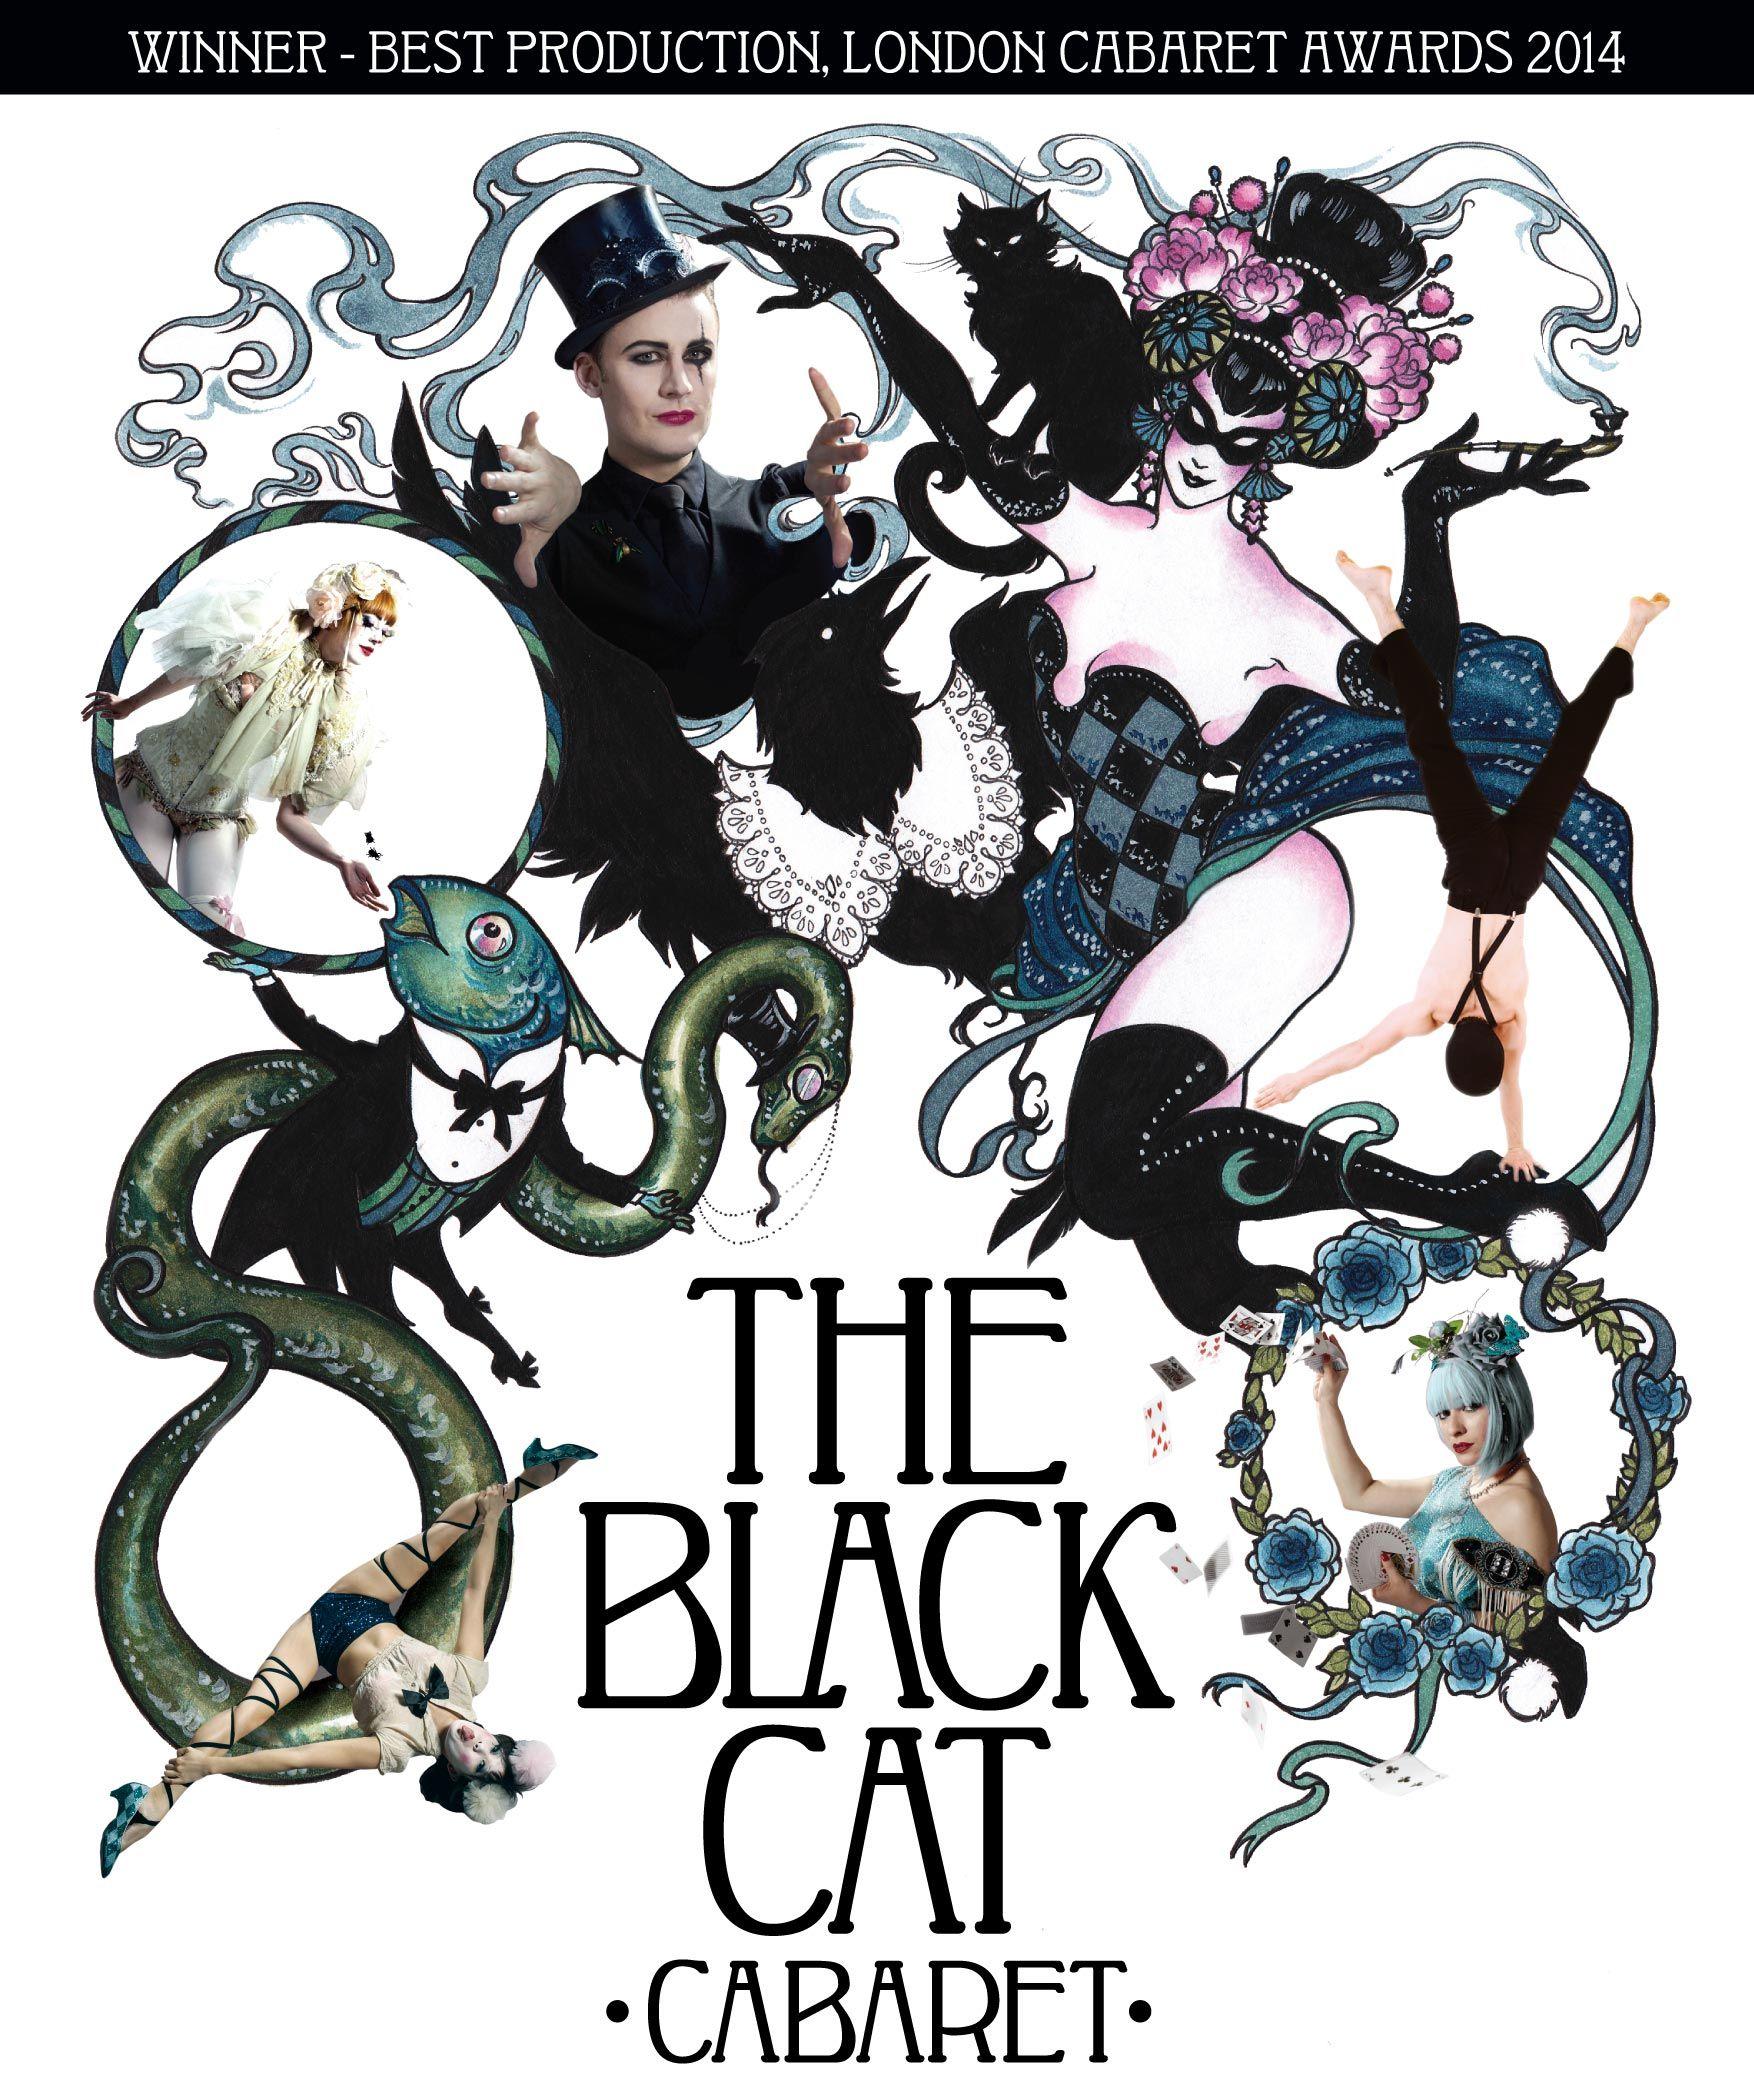 black cat cabaret purveyors of cabaret noir london award winning